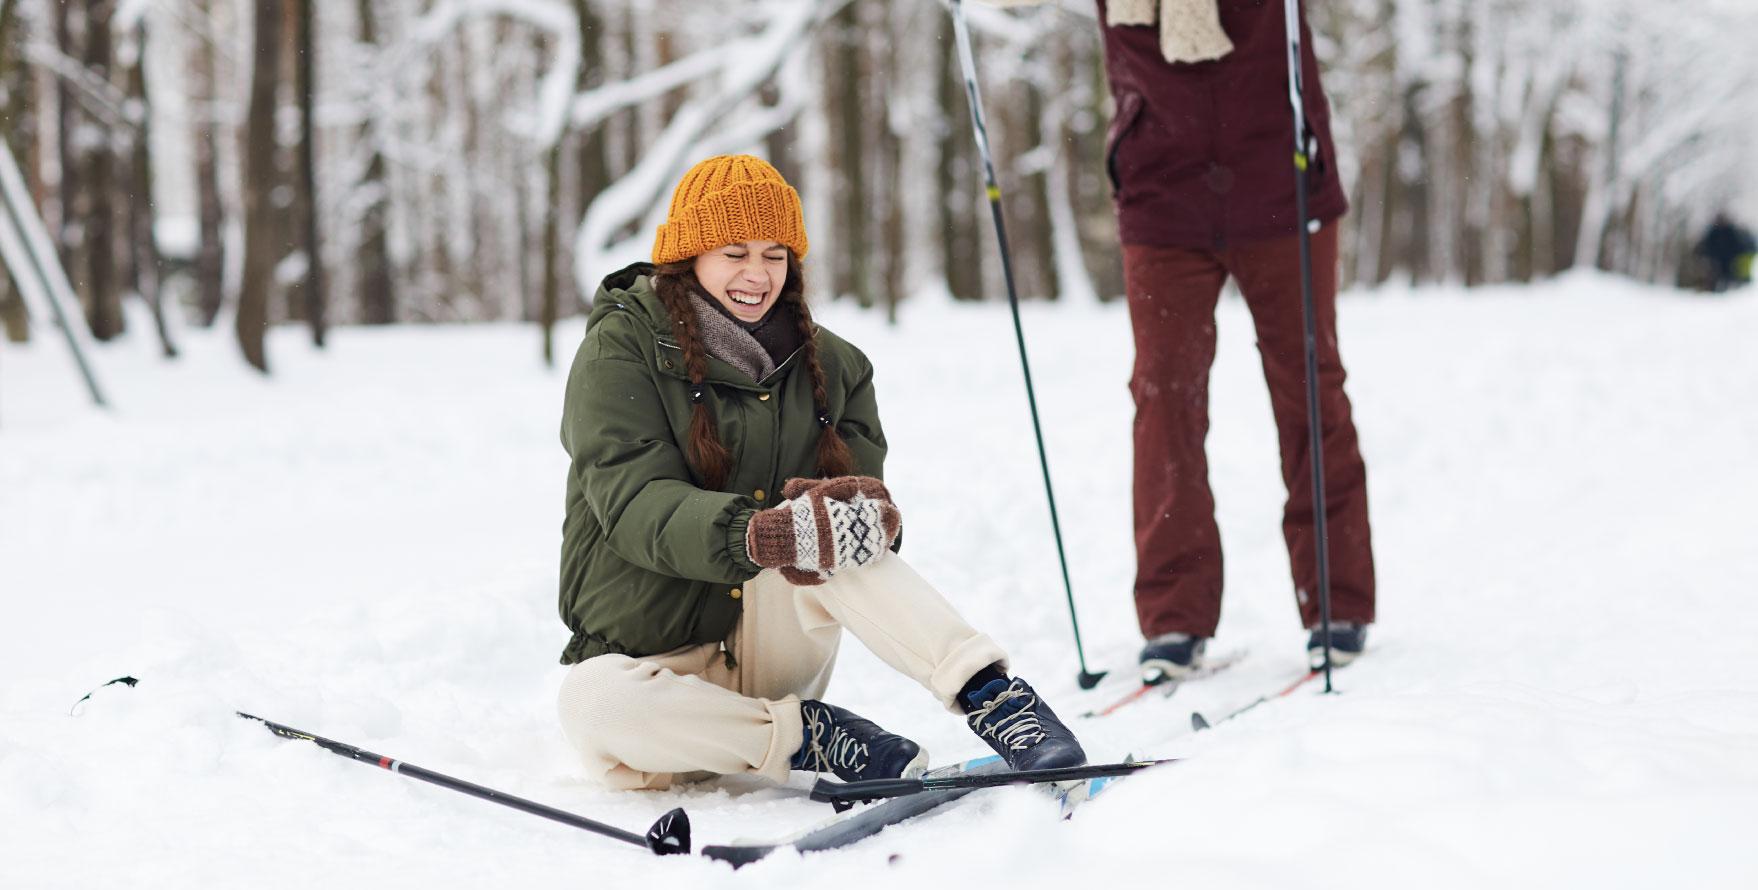 ski injury wnyptot